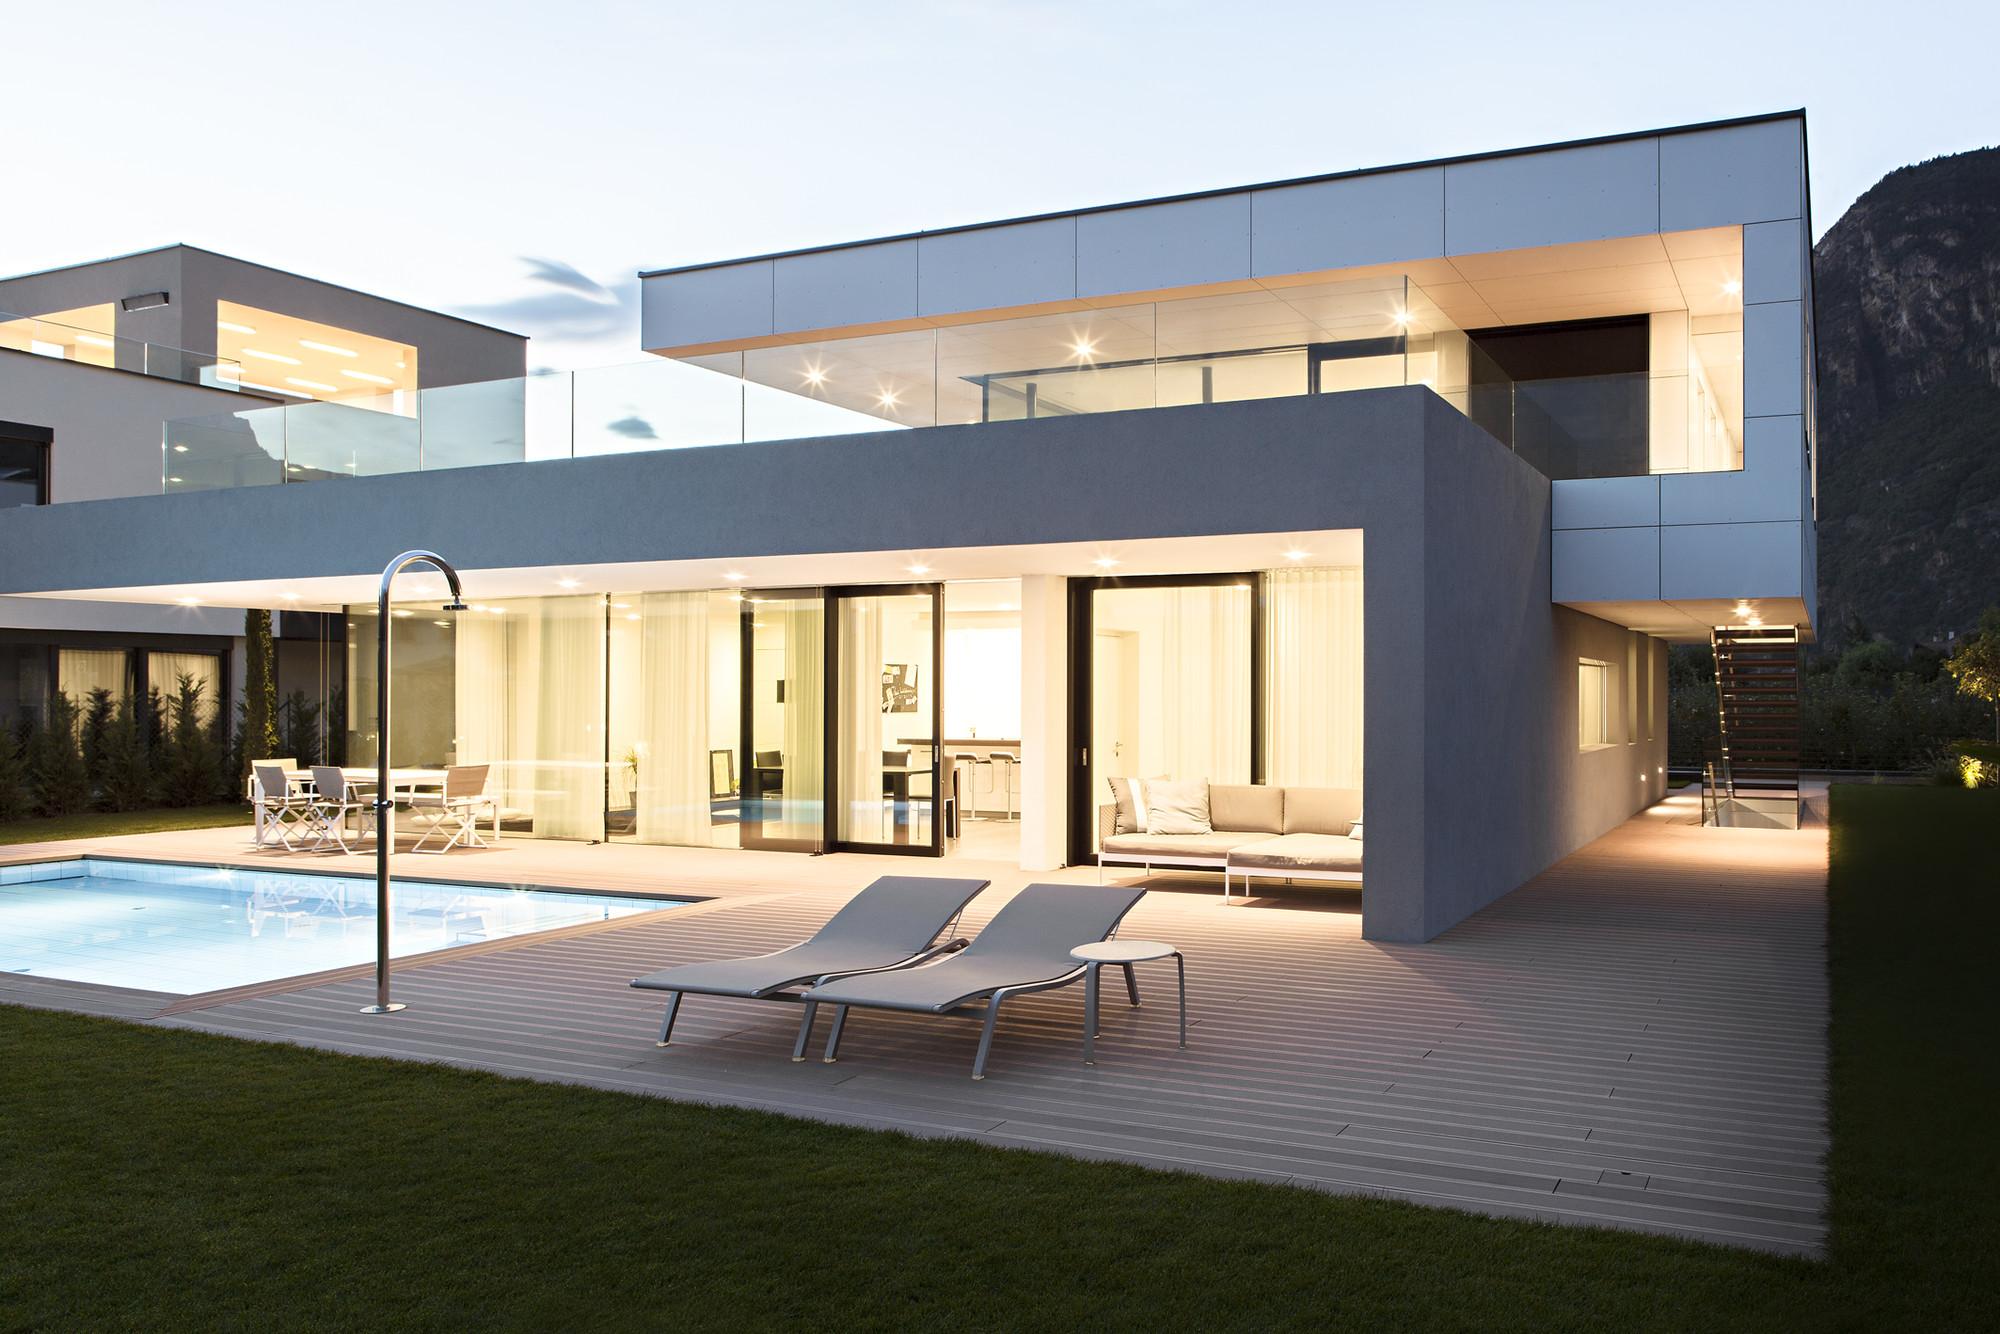 Casa M2 Monovolume Architecture Design Archdaily Brasil